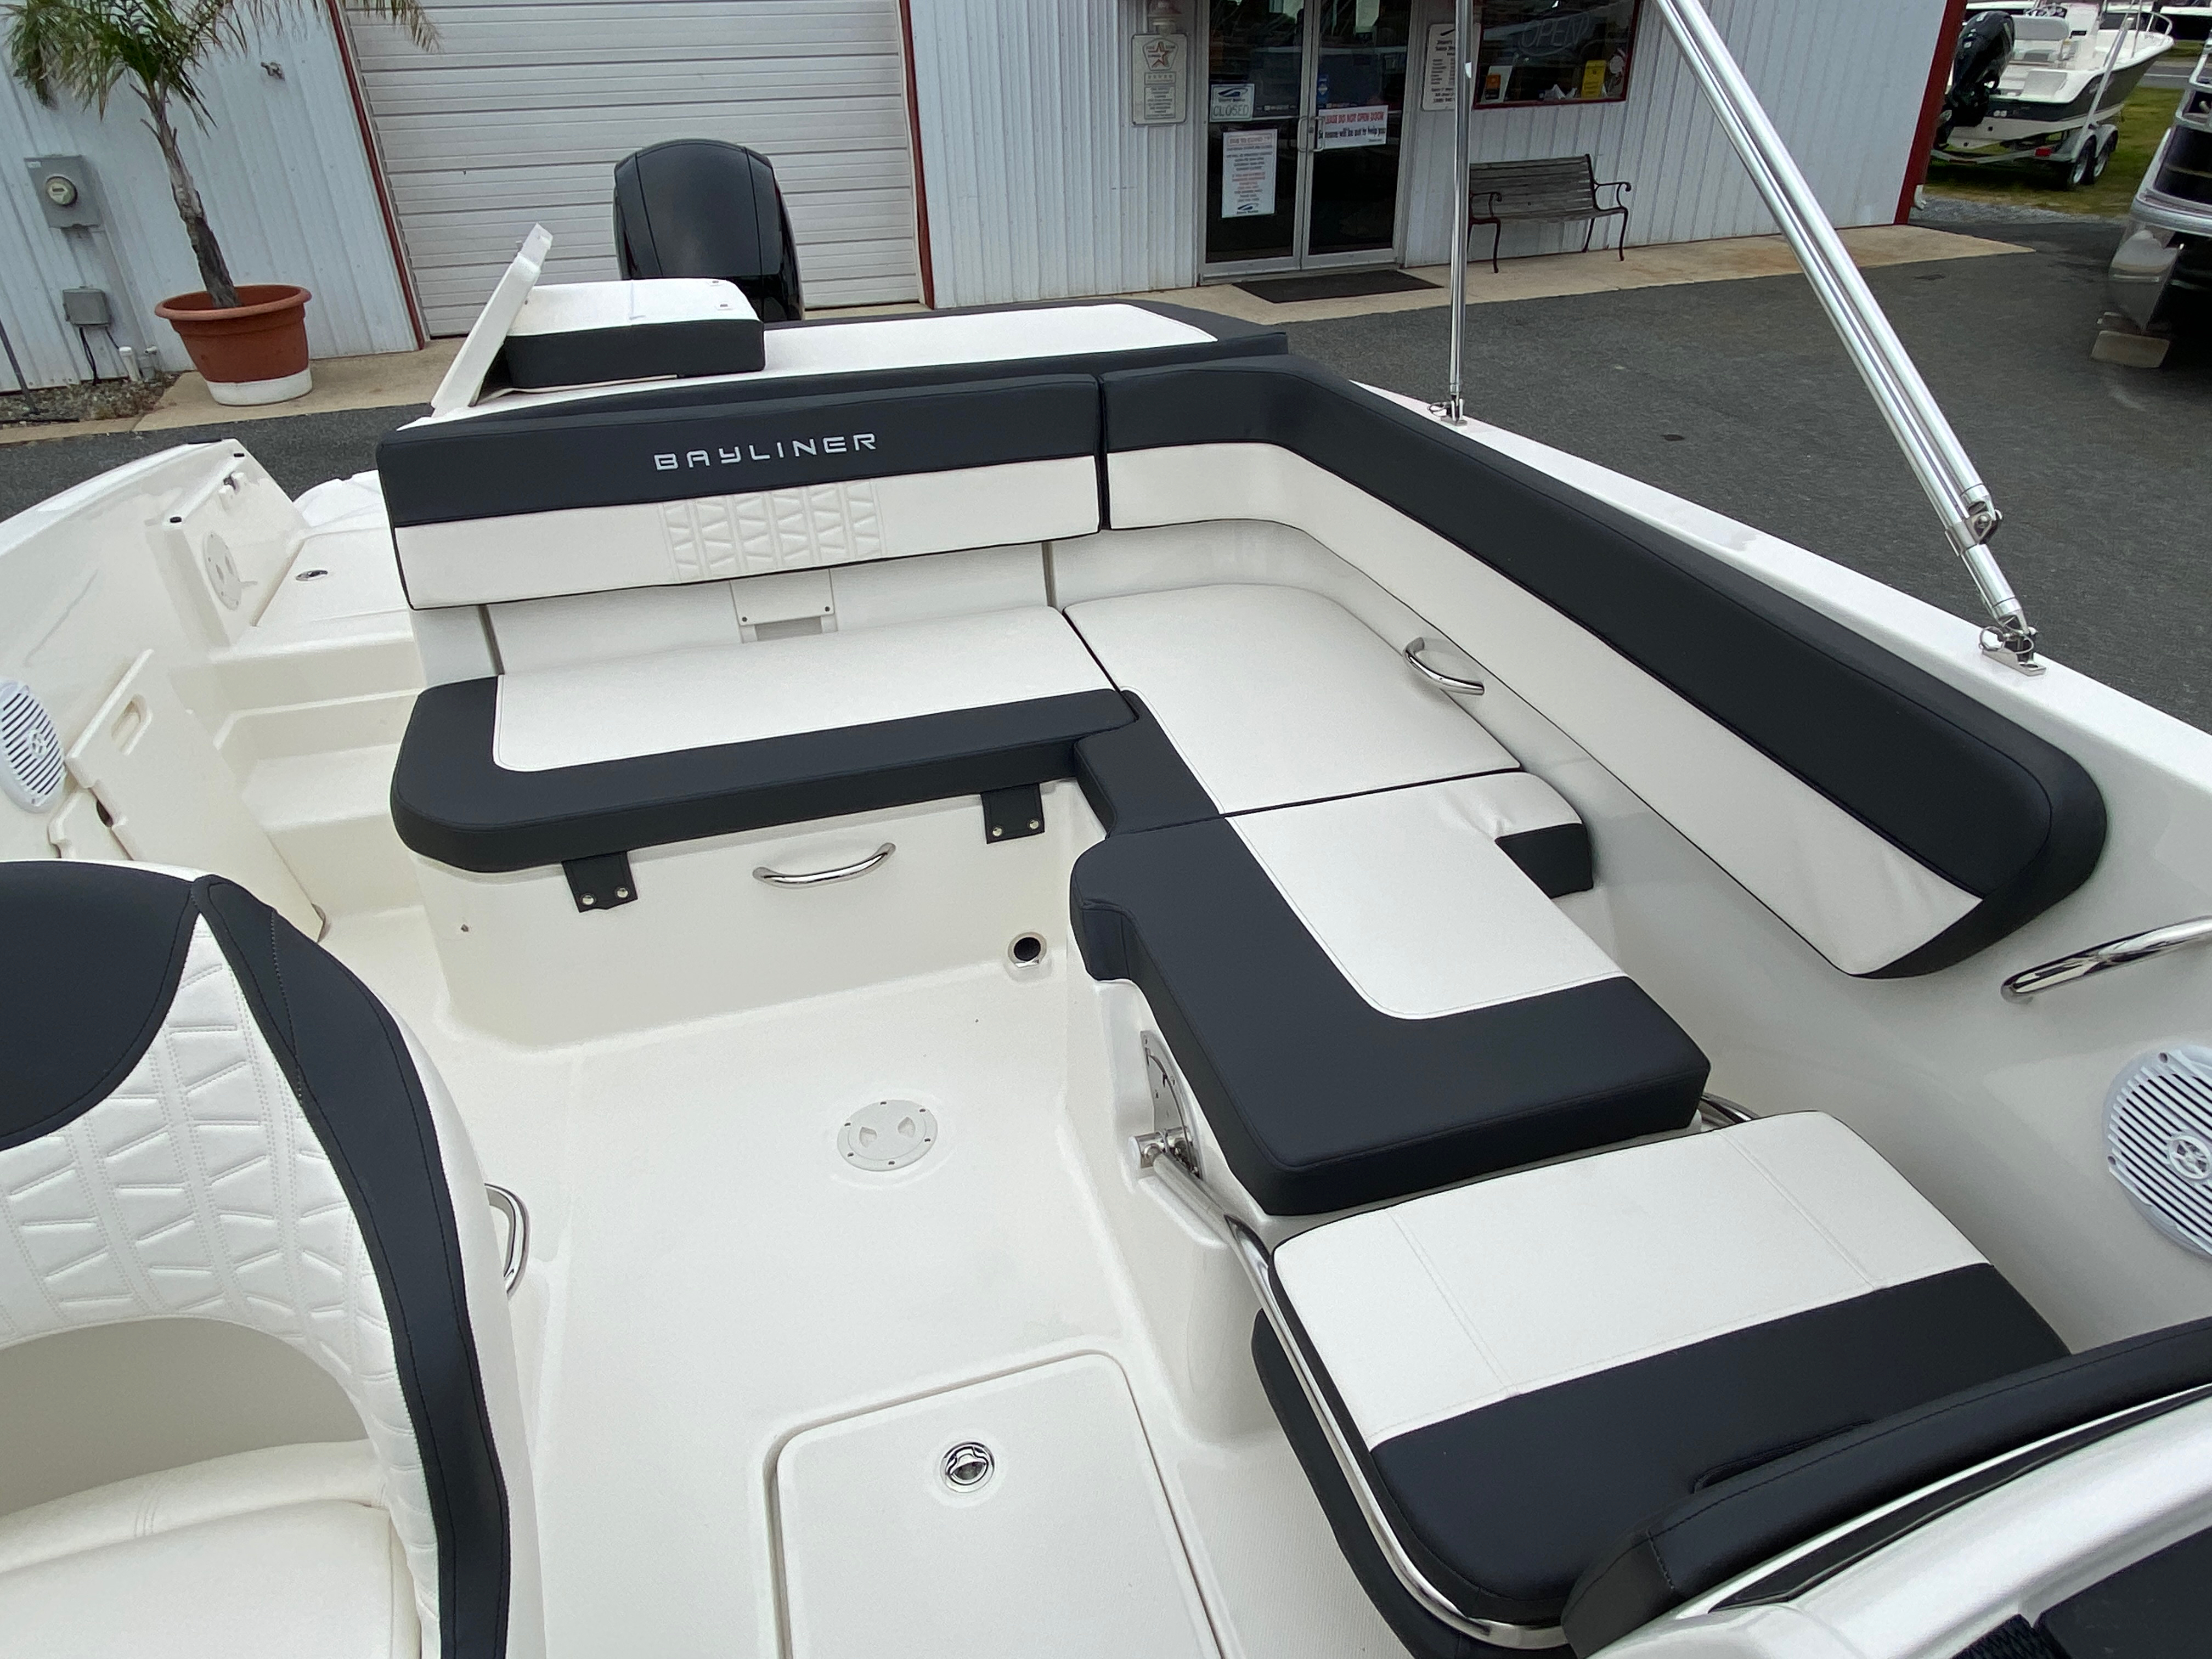 2020 Bayliner boat for sale, model of the boat is VR6 Bowrider & Image # 2 of 14